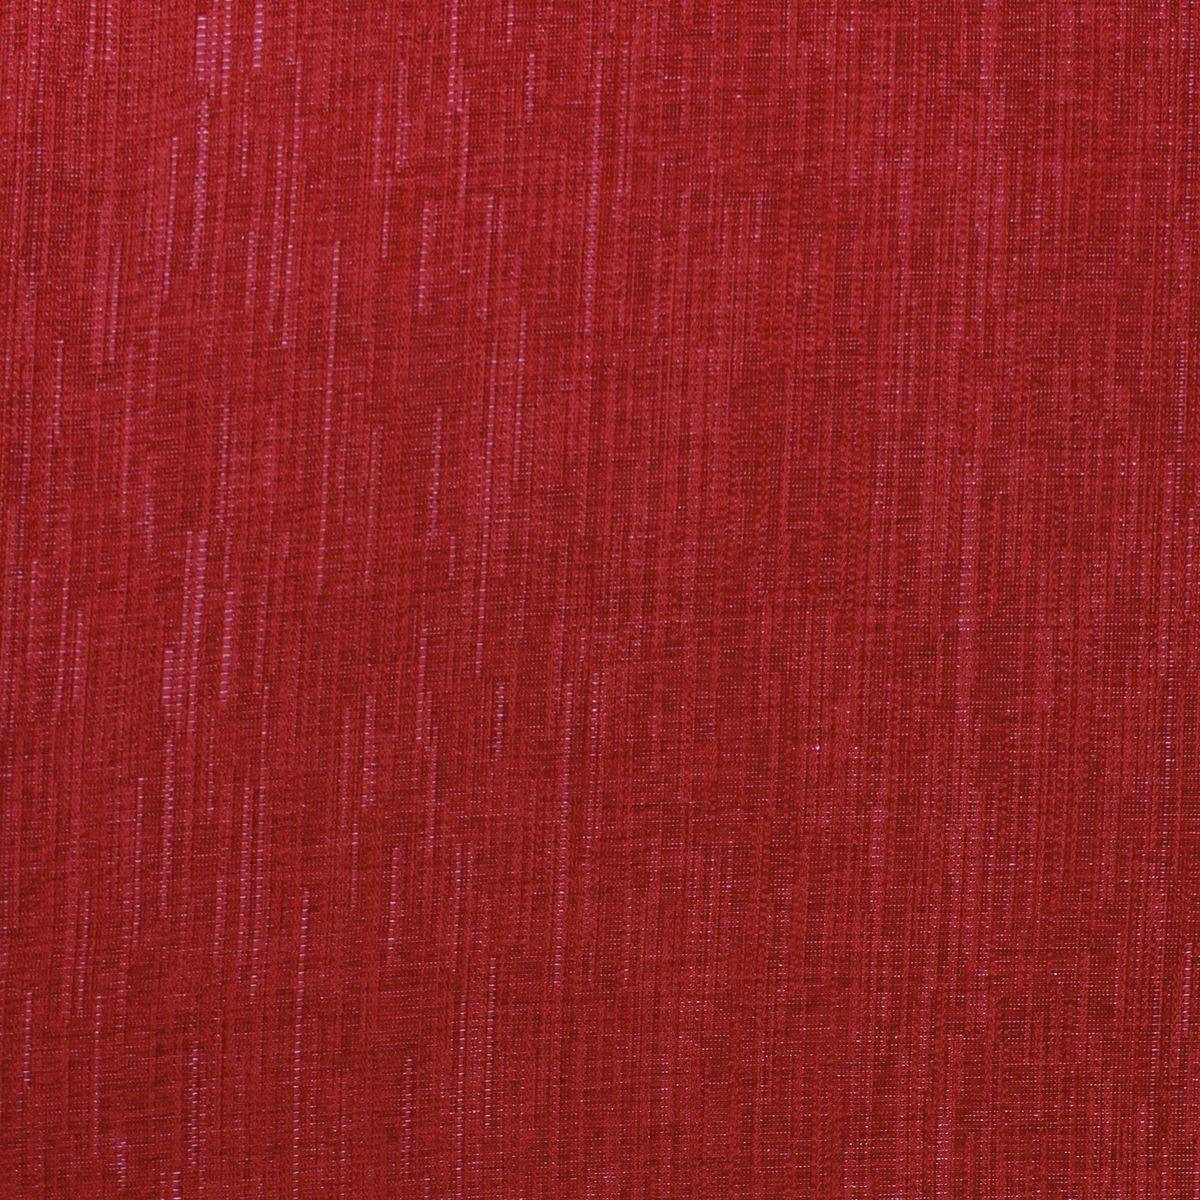 034-Chenille-034-Slubbed-Shabby-Worn-Look-Curtain-Cushion-Sofa-Upholstery-Fabric thumbnail 67